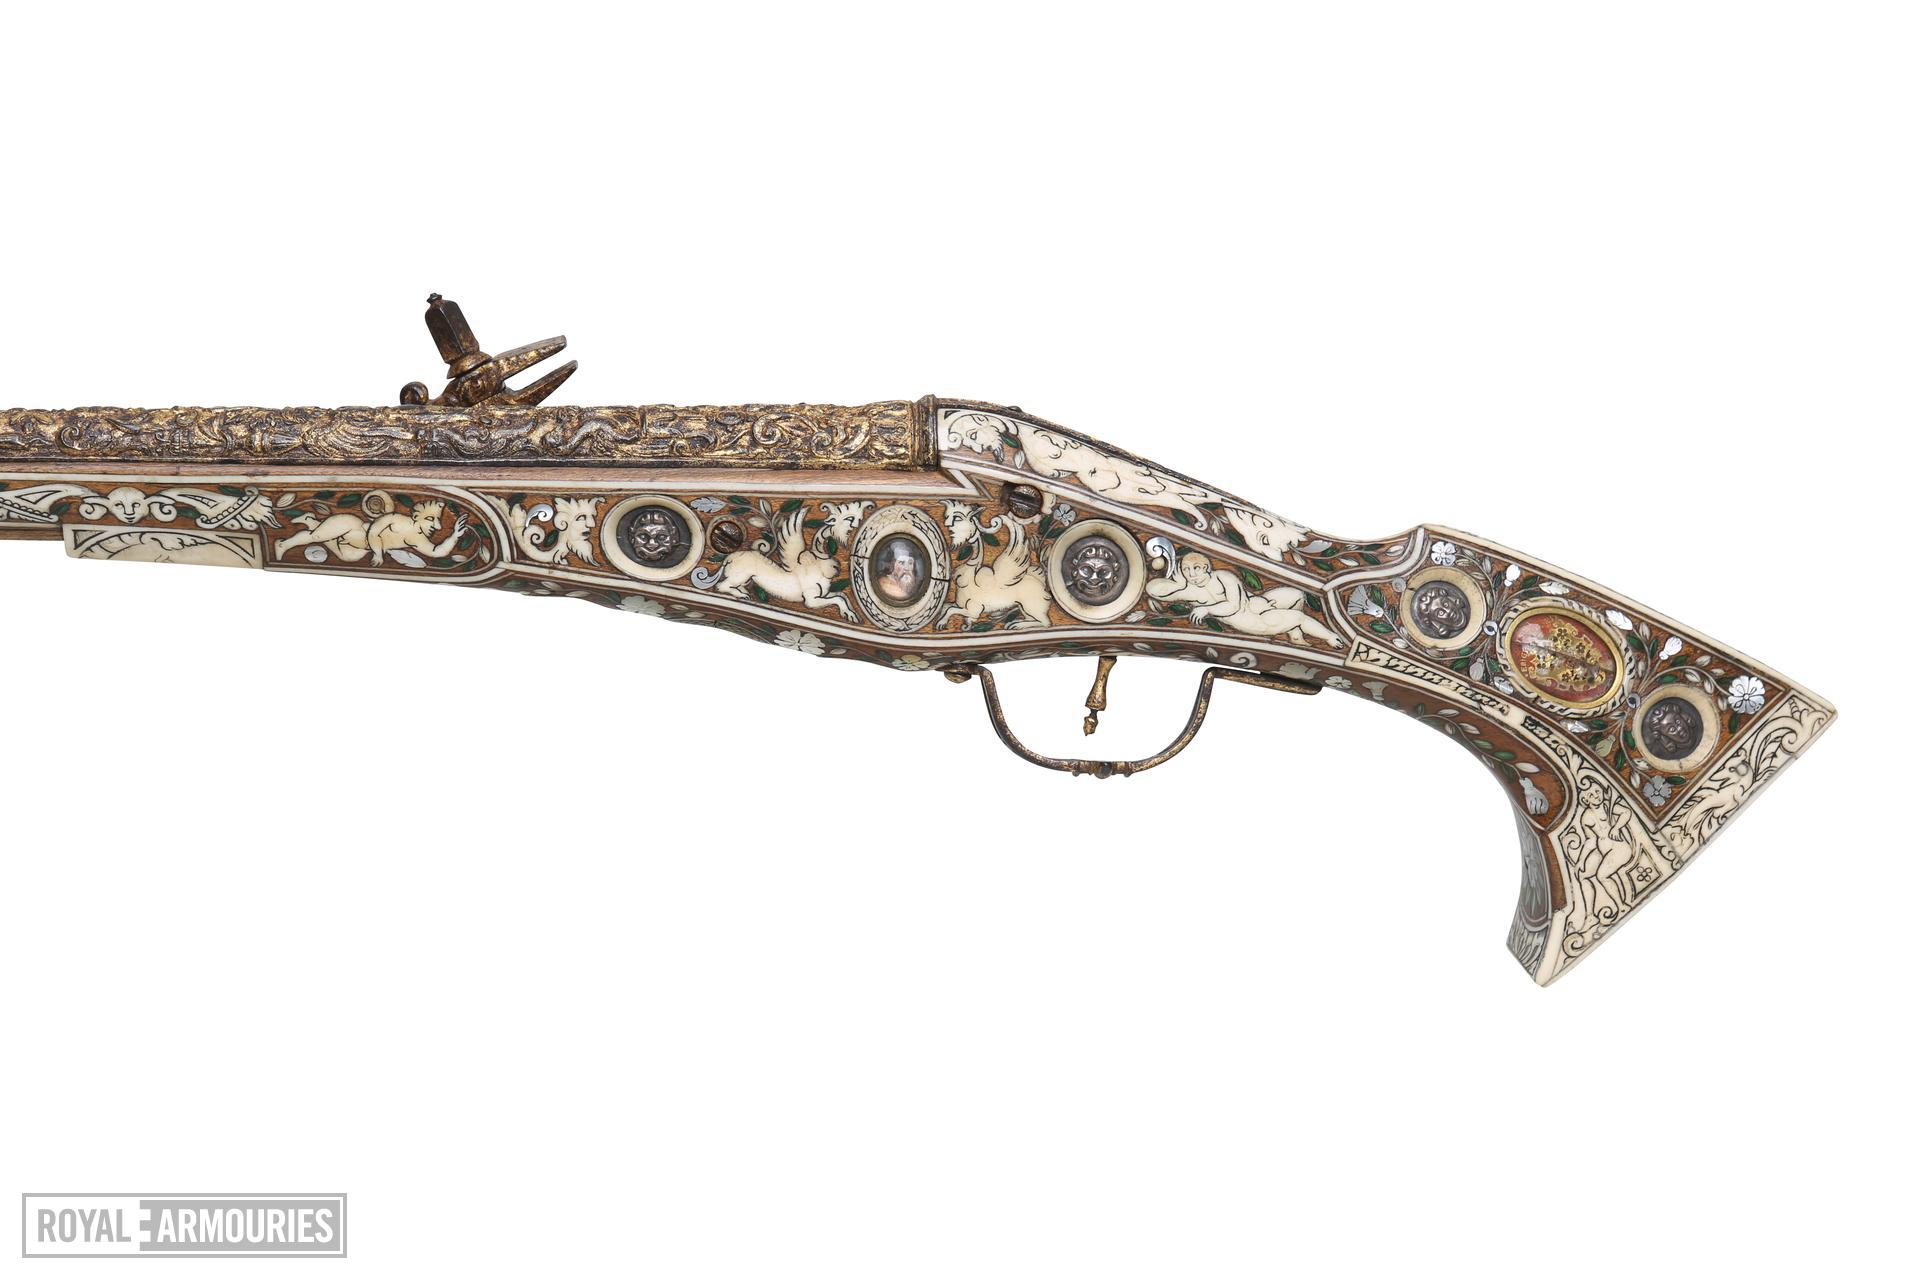 Wheellock pistol - 'Forget-me-not'